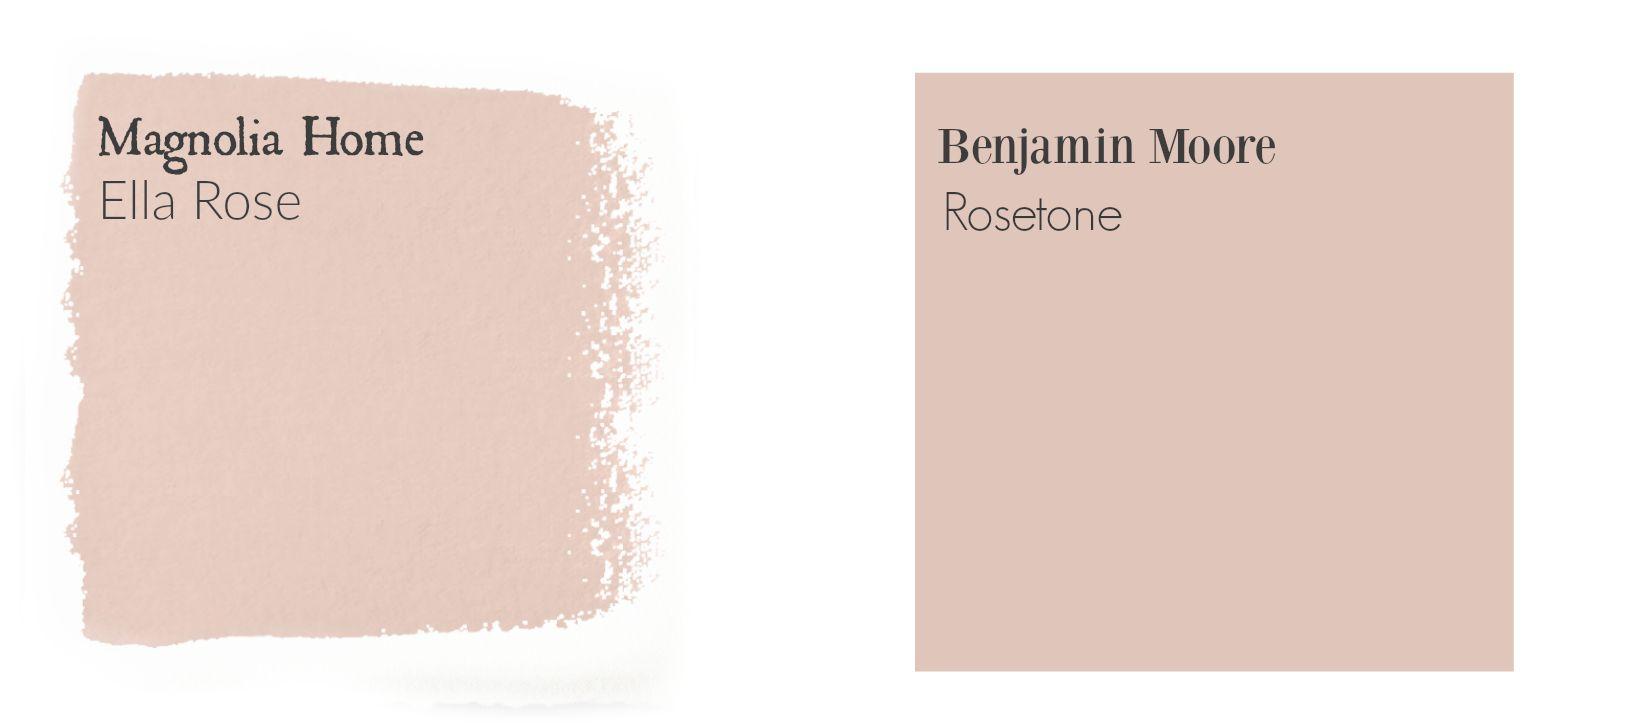 Ella rose color match magnolia homes paint magnolia paint colors fixer upper paint colors